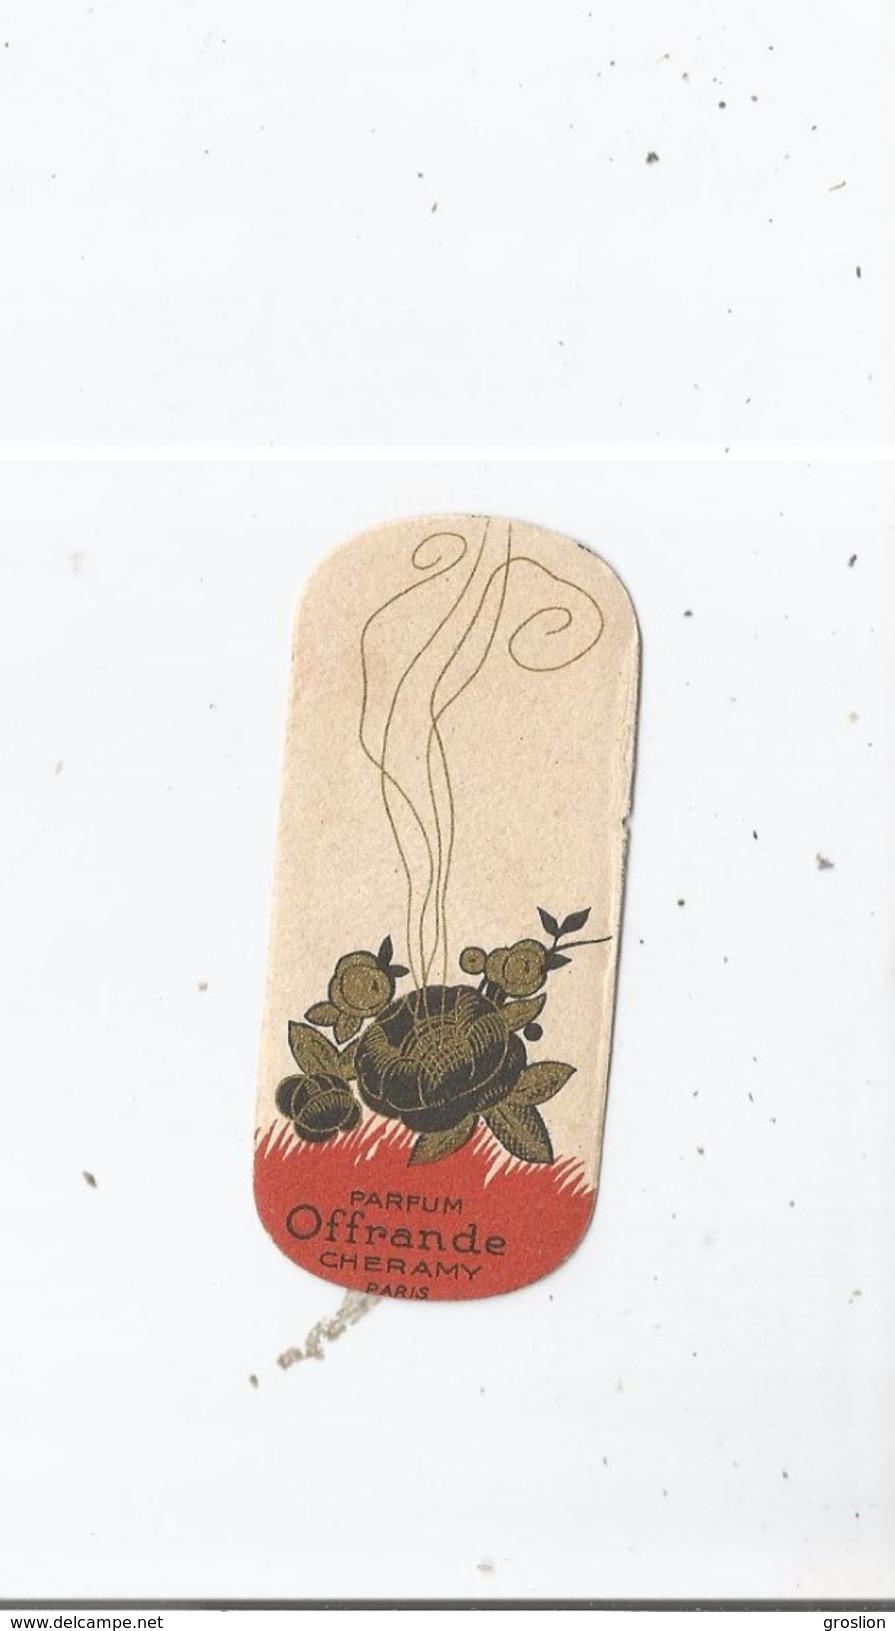 CARTE PARFUMEE ANCIENNE OFFRANDE DE CHERAMY PARIS - Perfume Cards